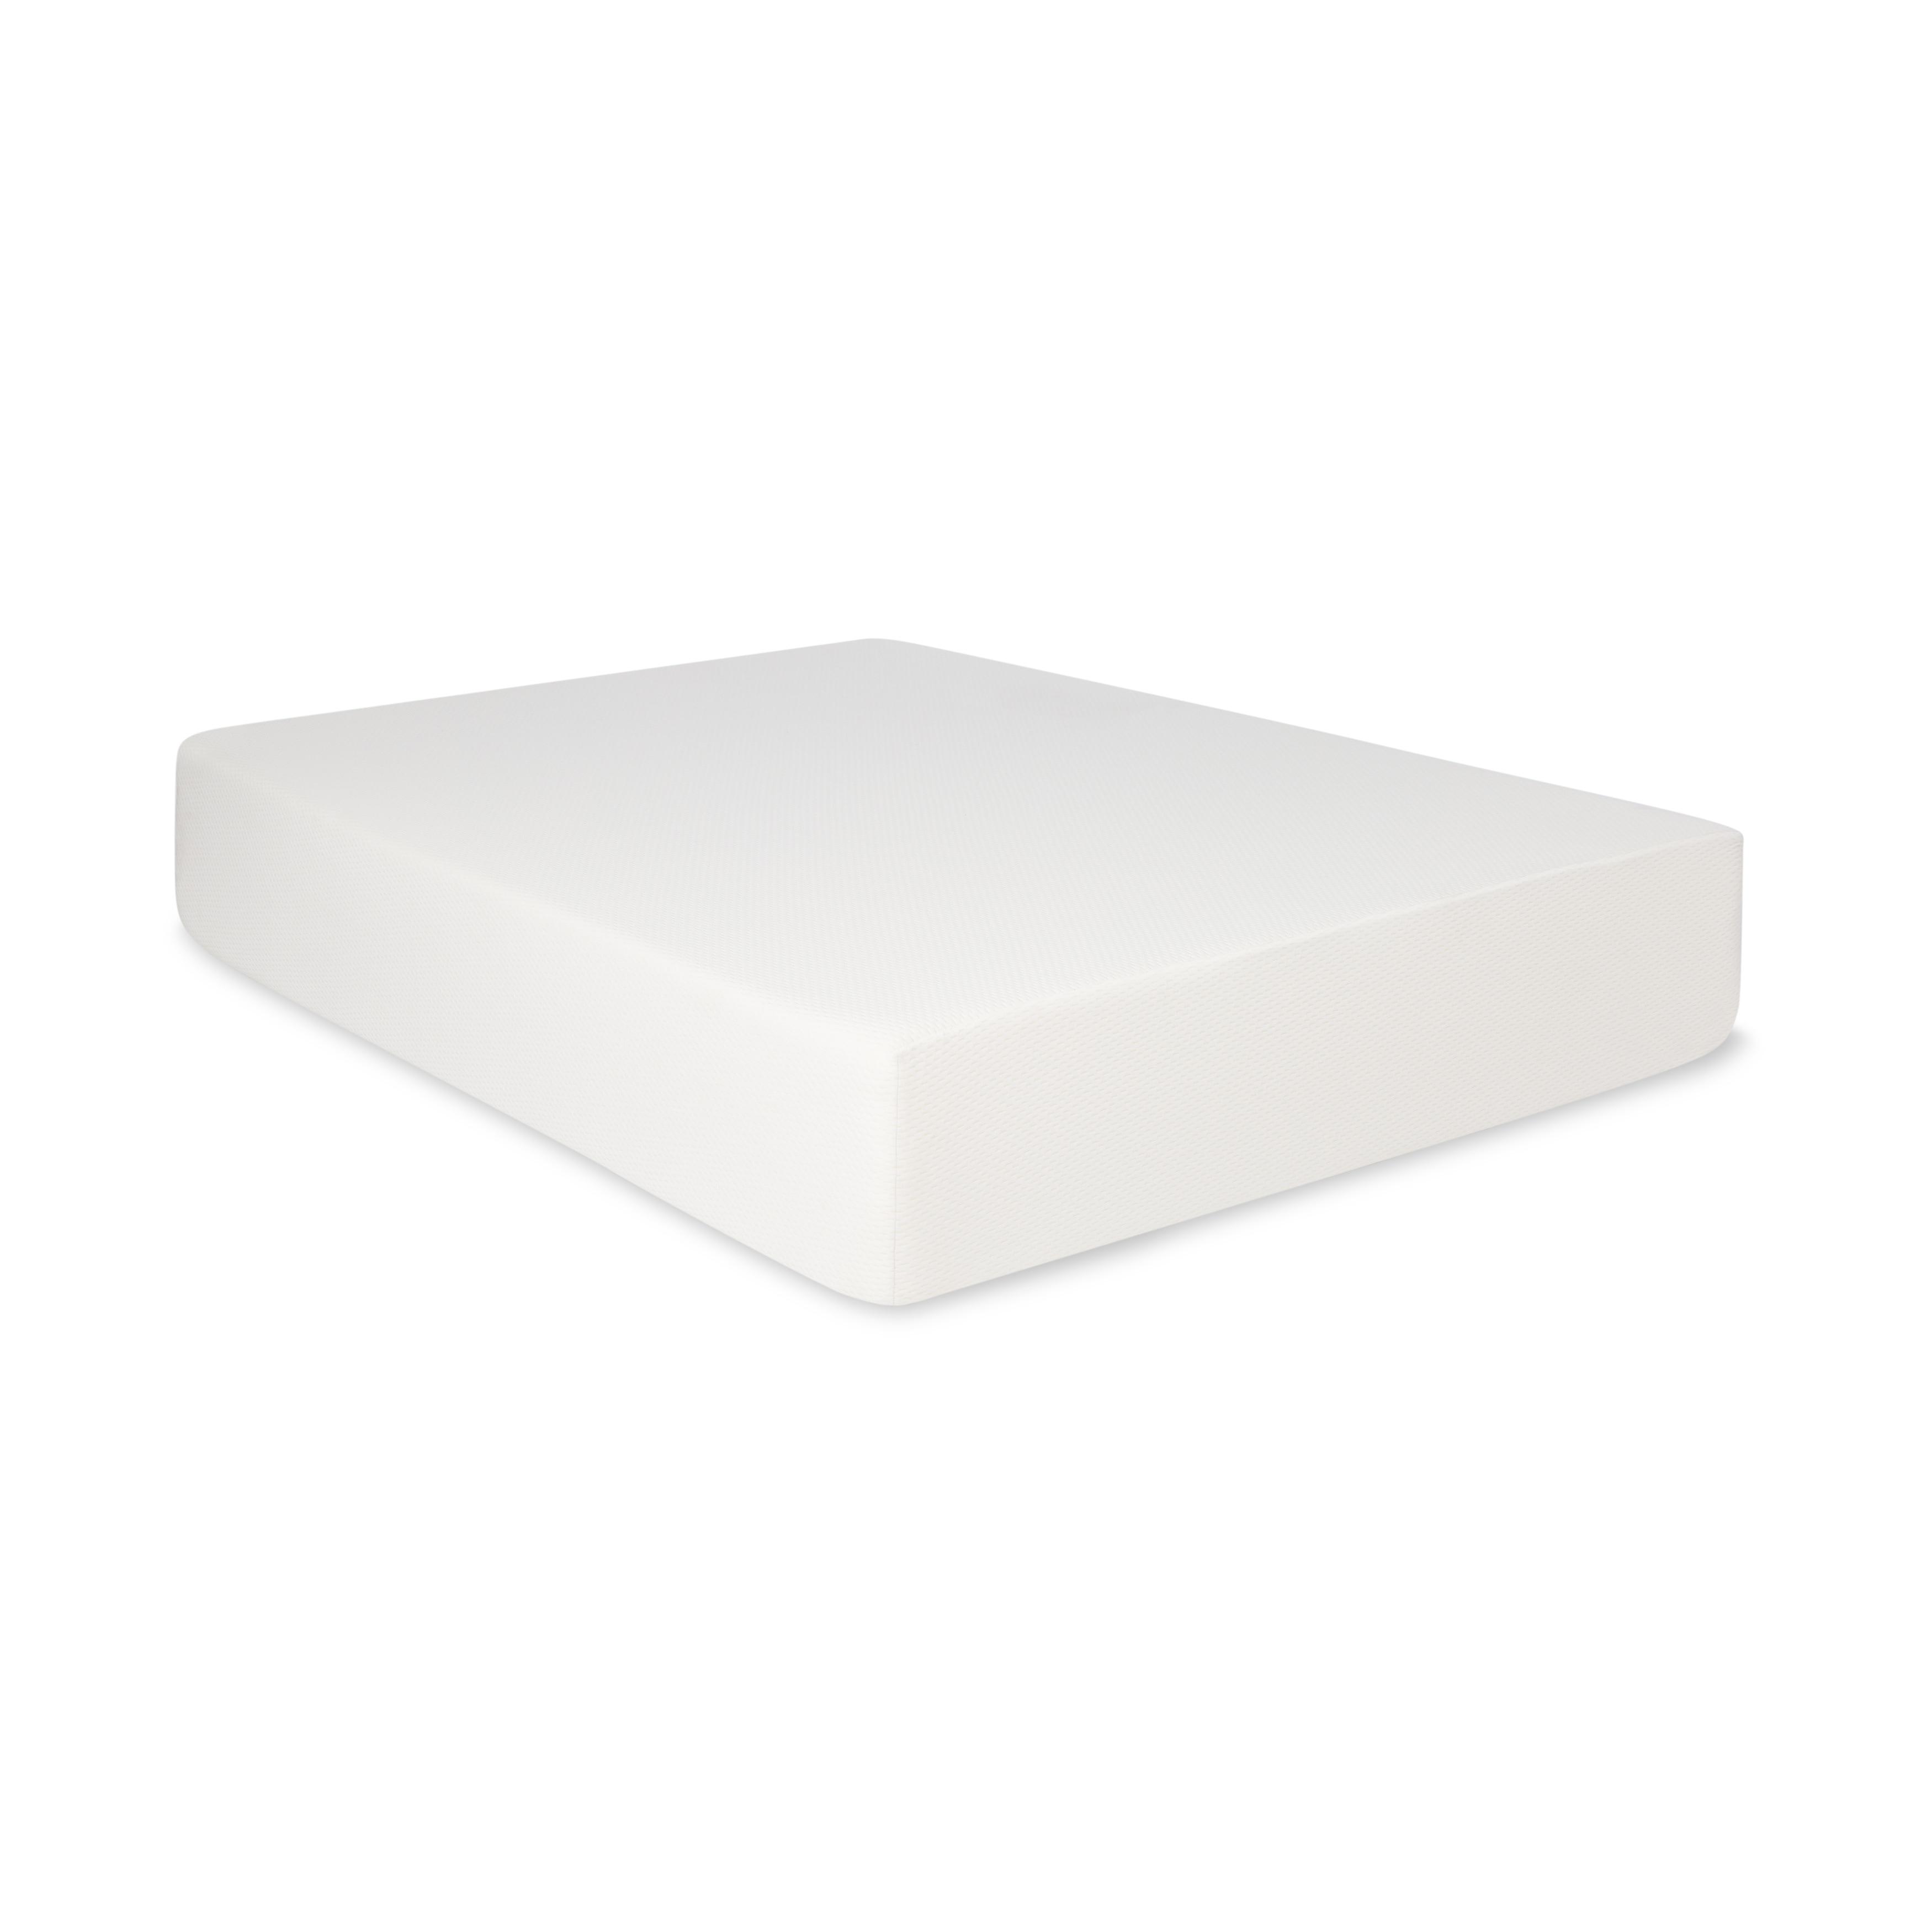 Select Luxury Medium Firm 14 inch Full size Memory Foam Mattress